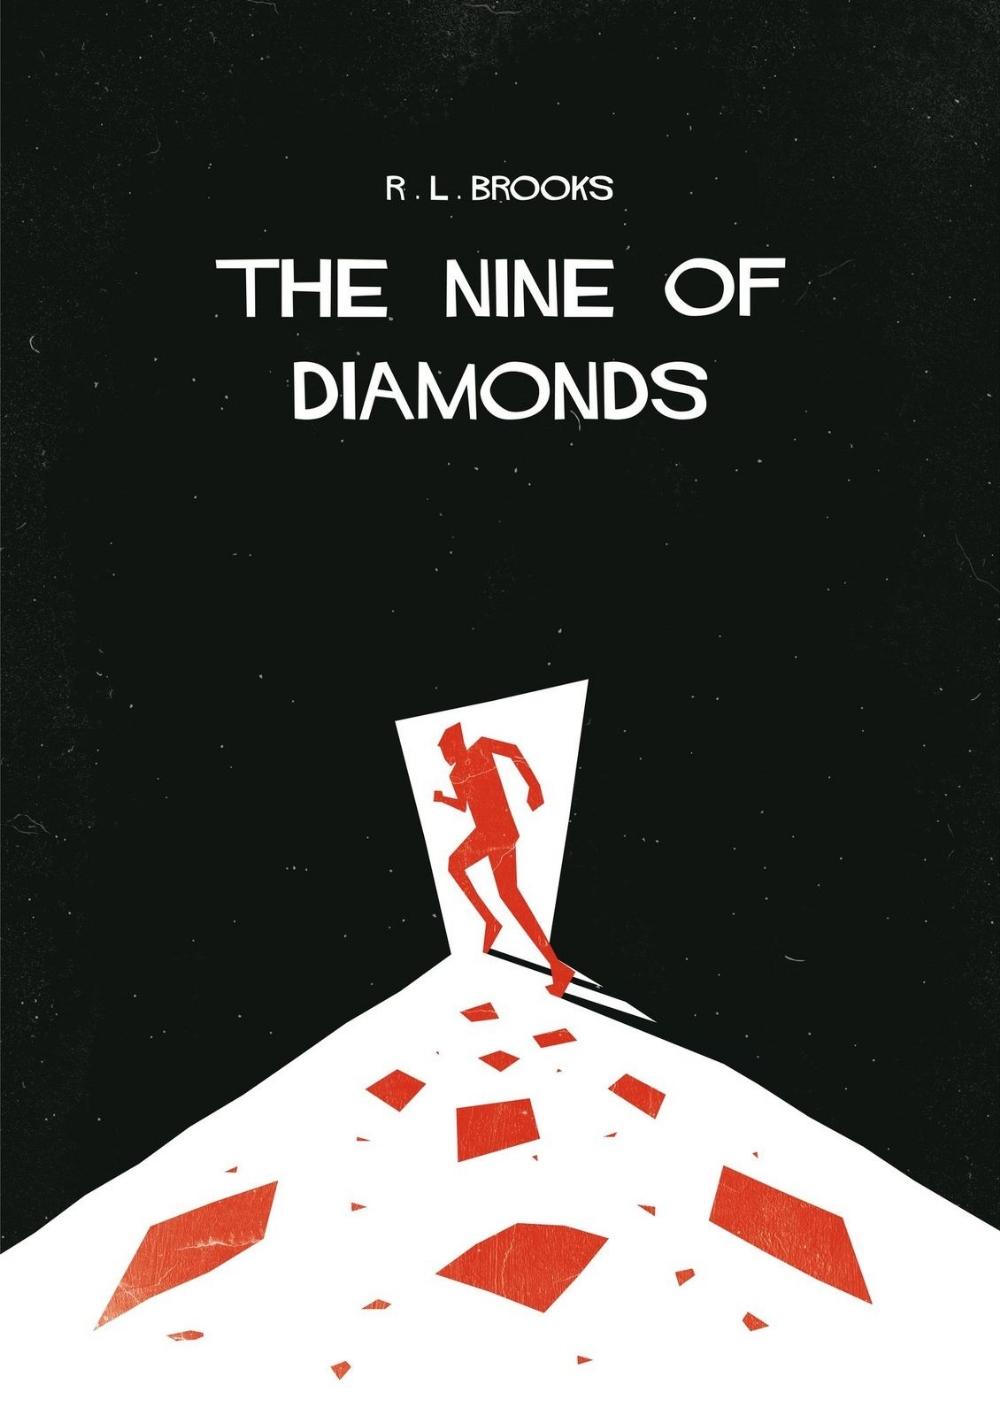 Dan Jennings (British). '9 of Diamonds'. Mixed media on paper. Rolled. Daniel is a freelance